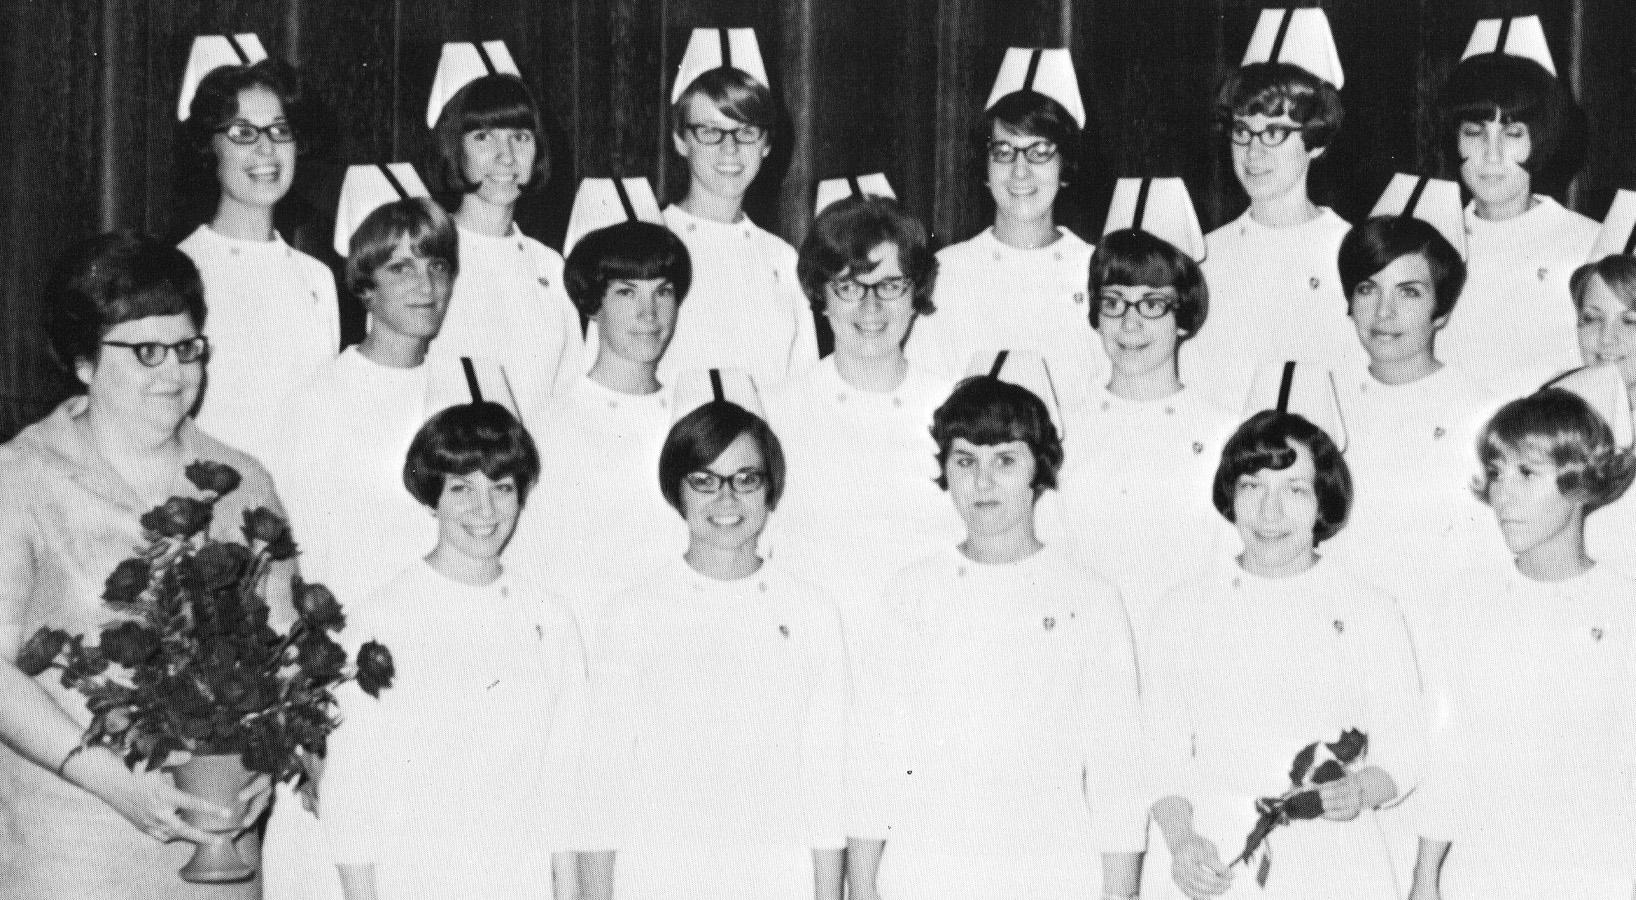 Hesston College's first graduating class of nurses